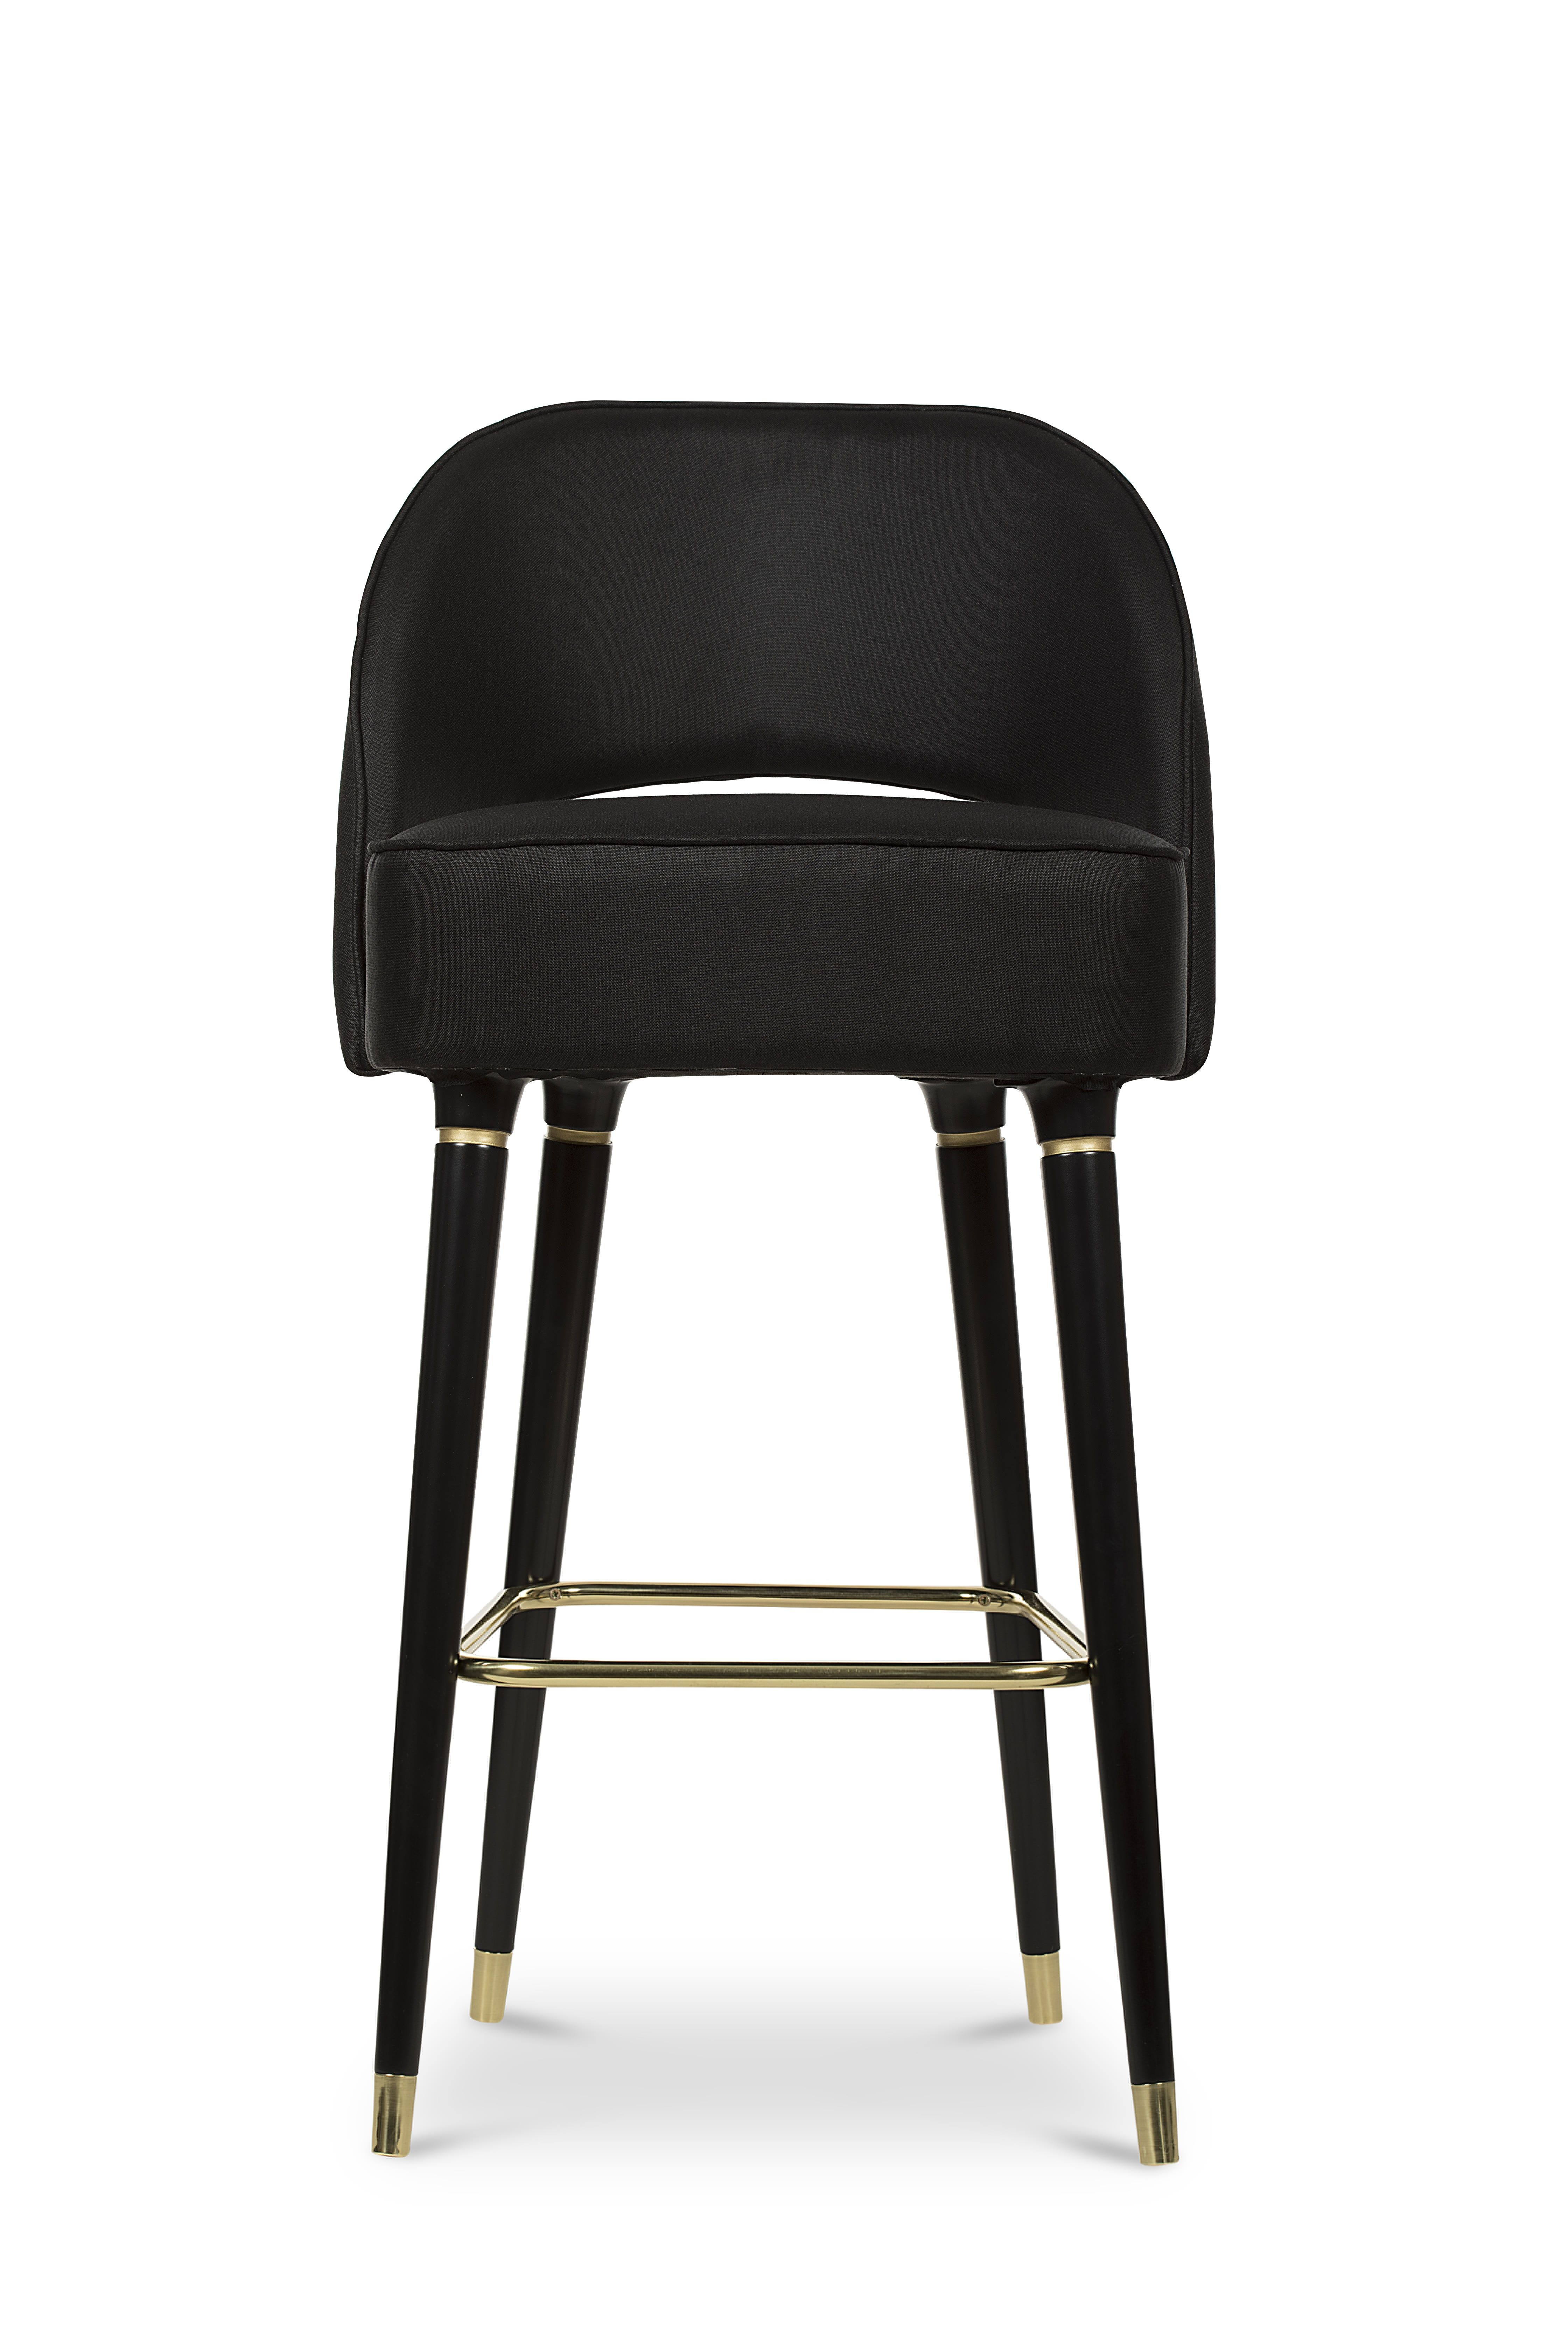 Collins Bar Chair Contemporary Transitional Mid Century Modern Barstools Counter Stools Dering Hall Sedie Da Bar Sgabelli Da Bar Bar Stile Vintage